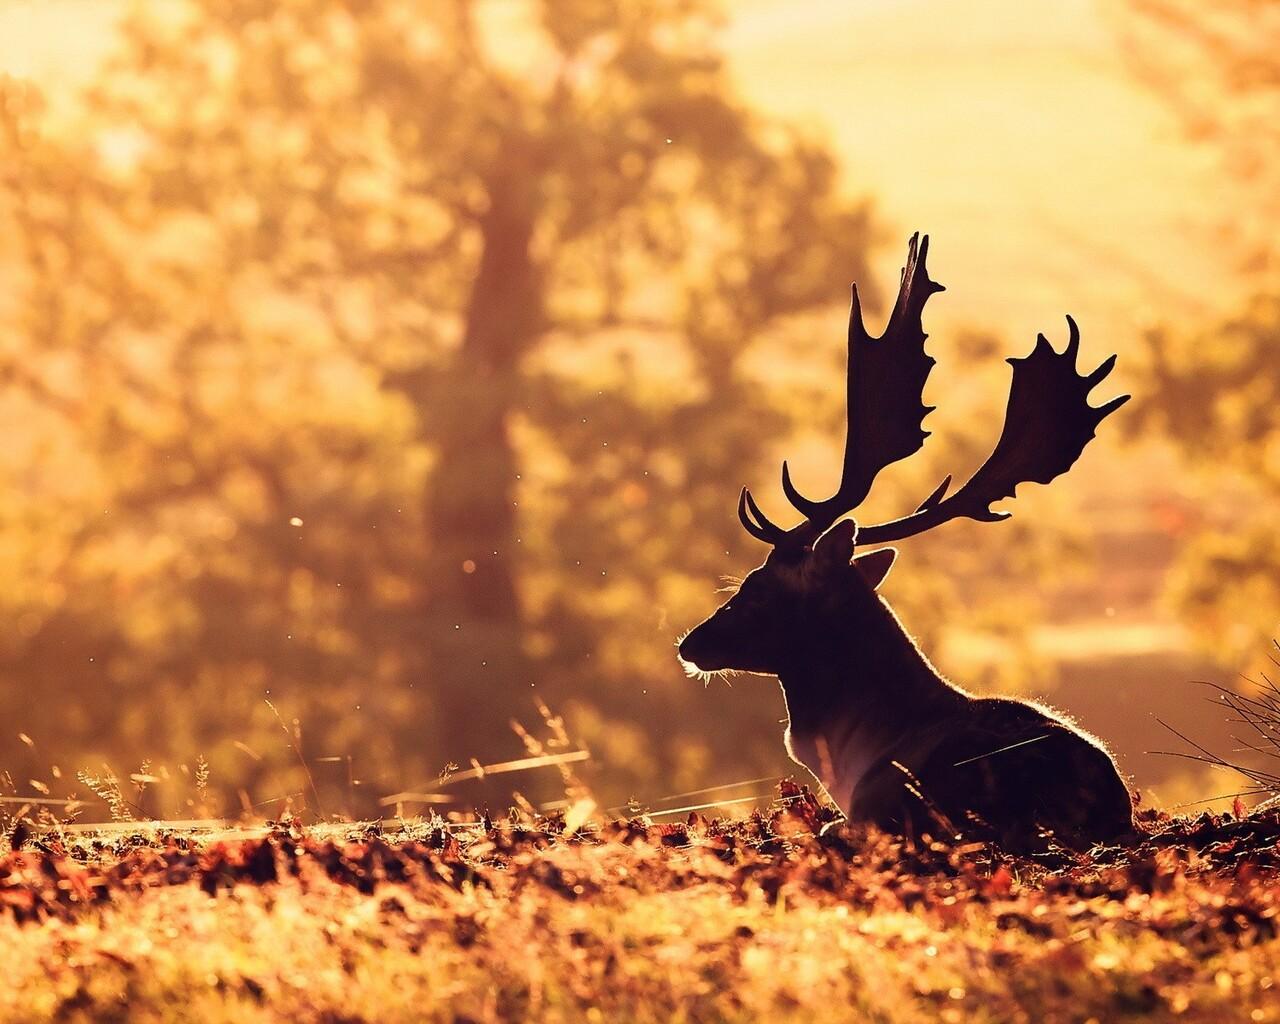 1280x1024 deer 1280x1024 resolution hd 4k wallpapers images